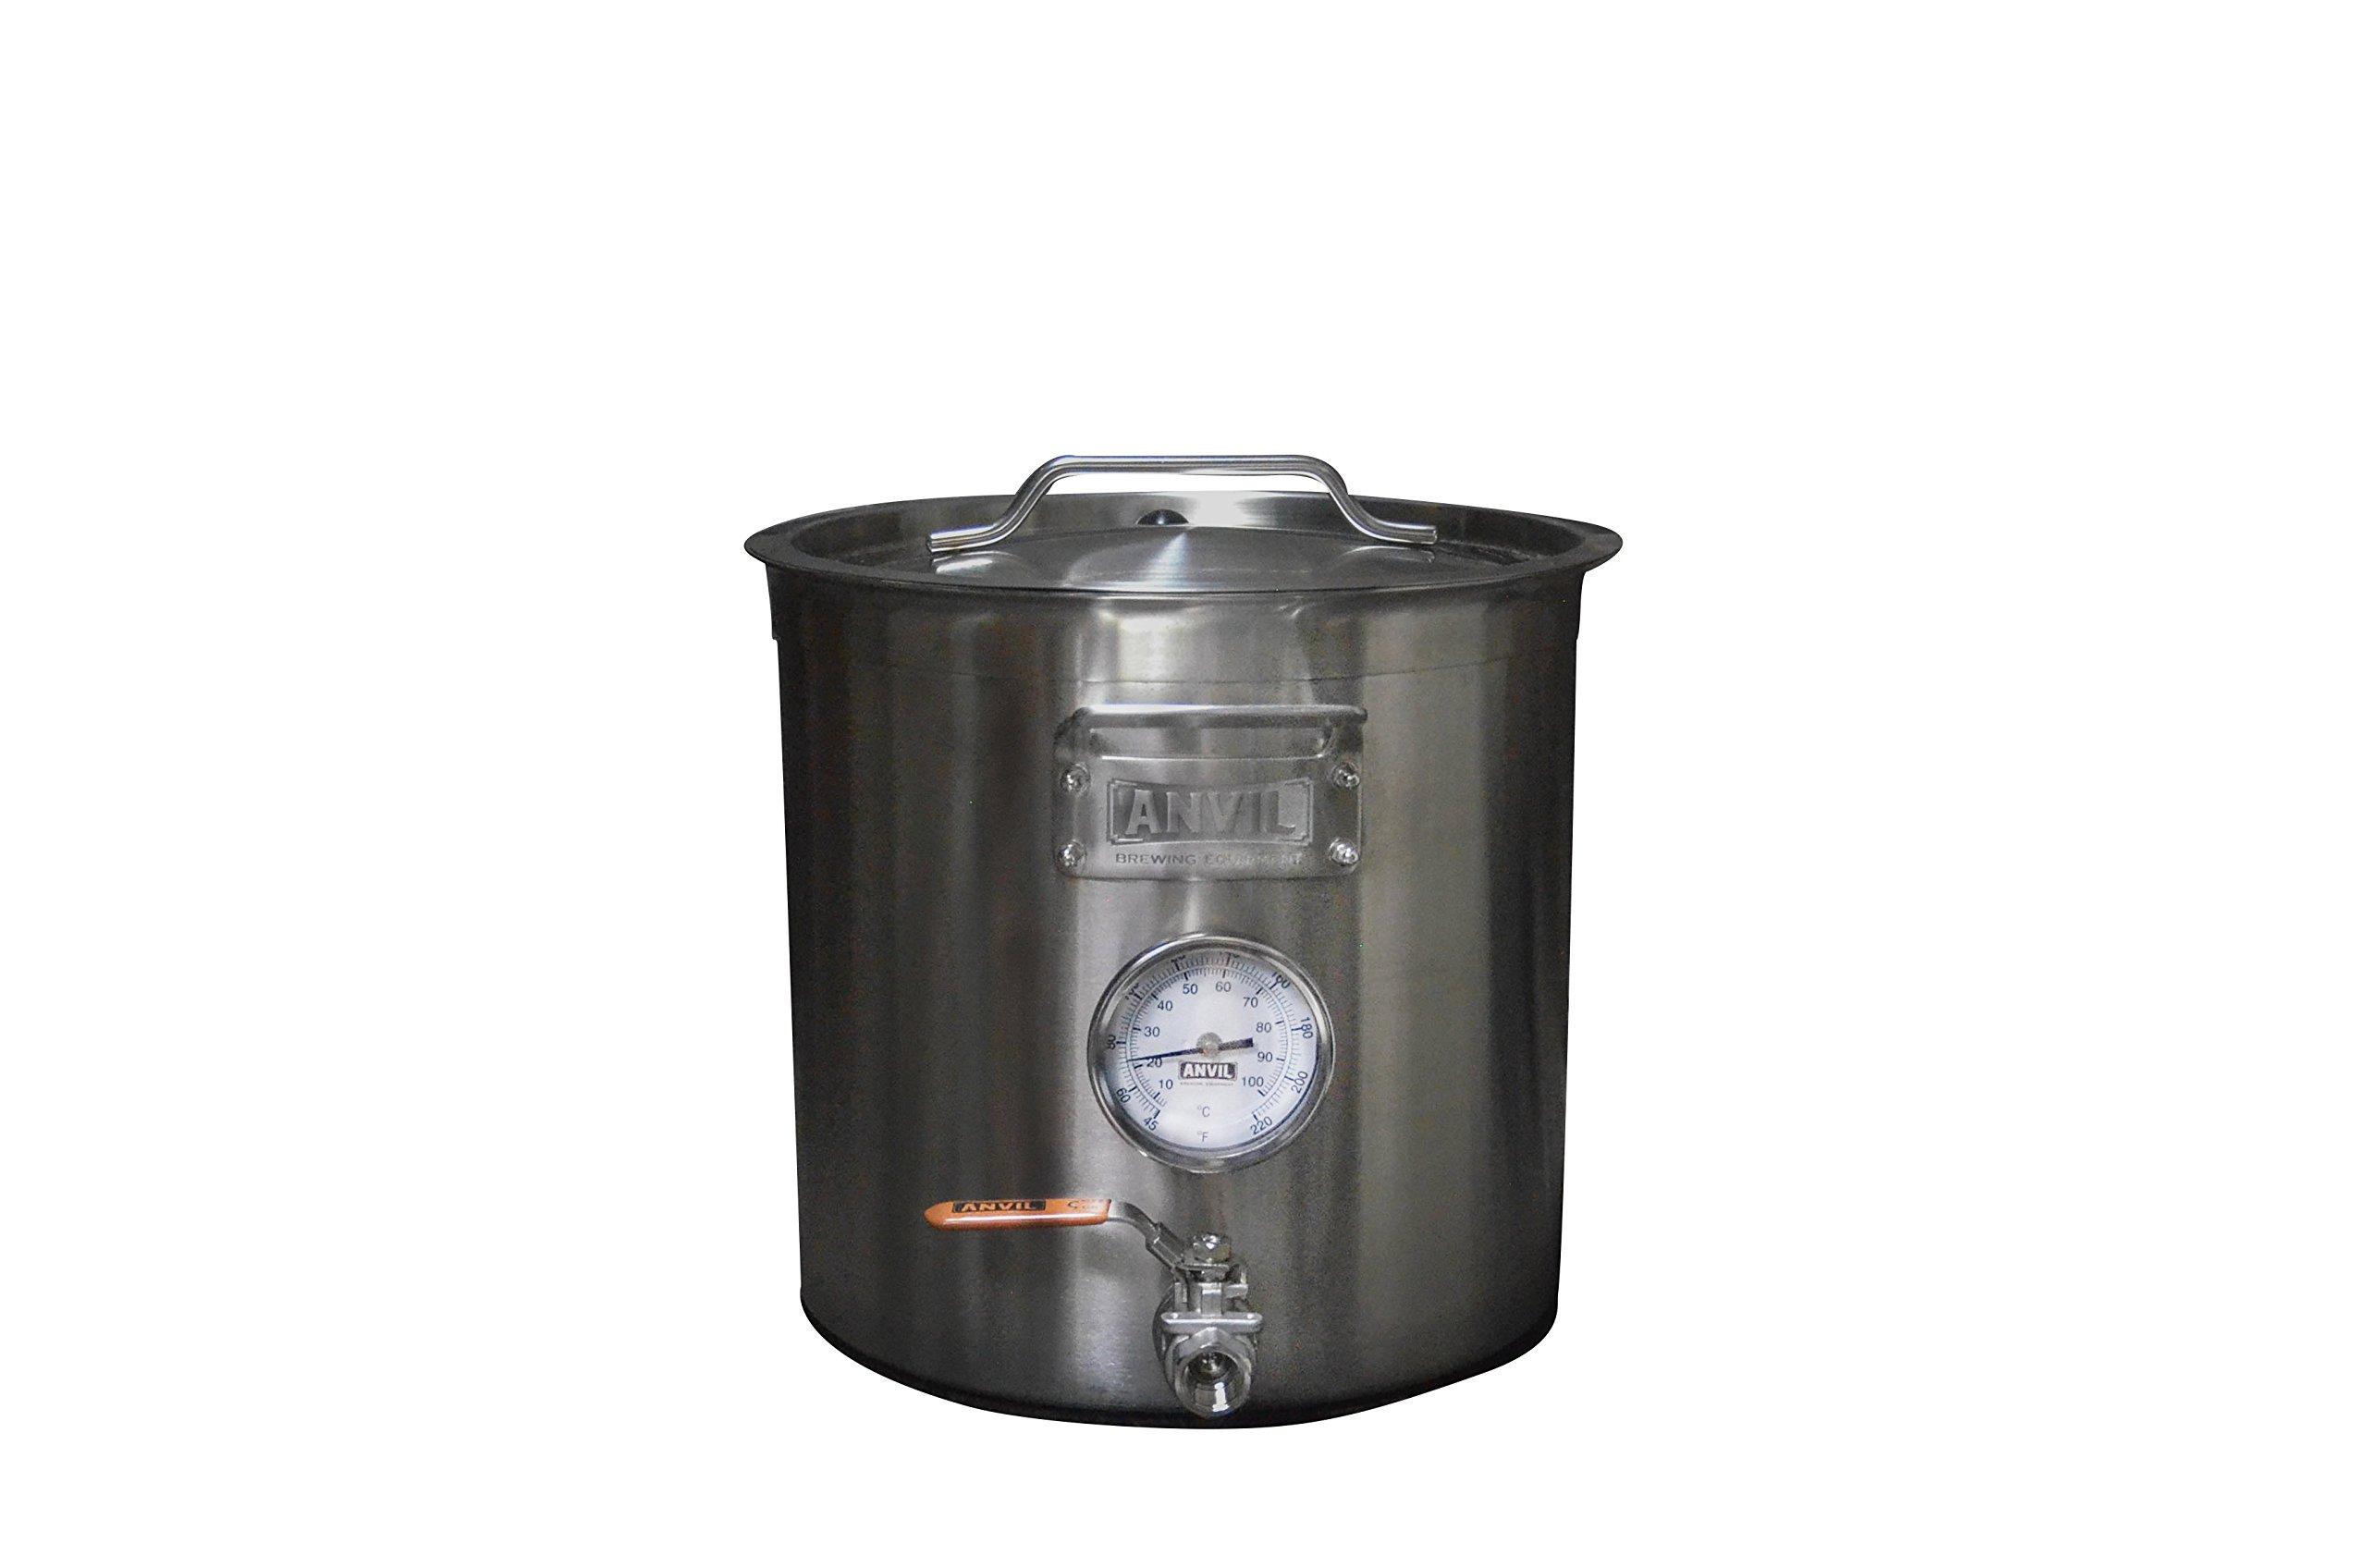 Anvil Brew Kettle 5 5 gal